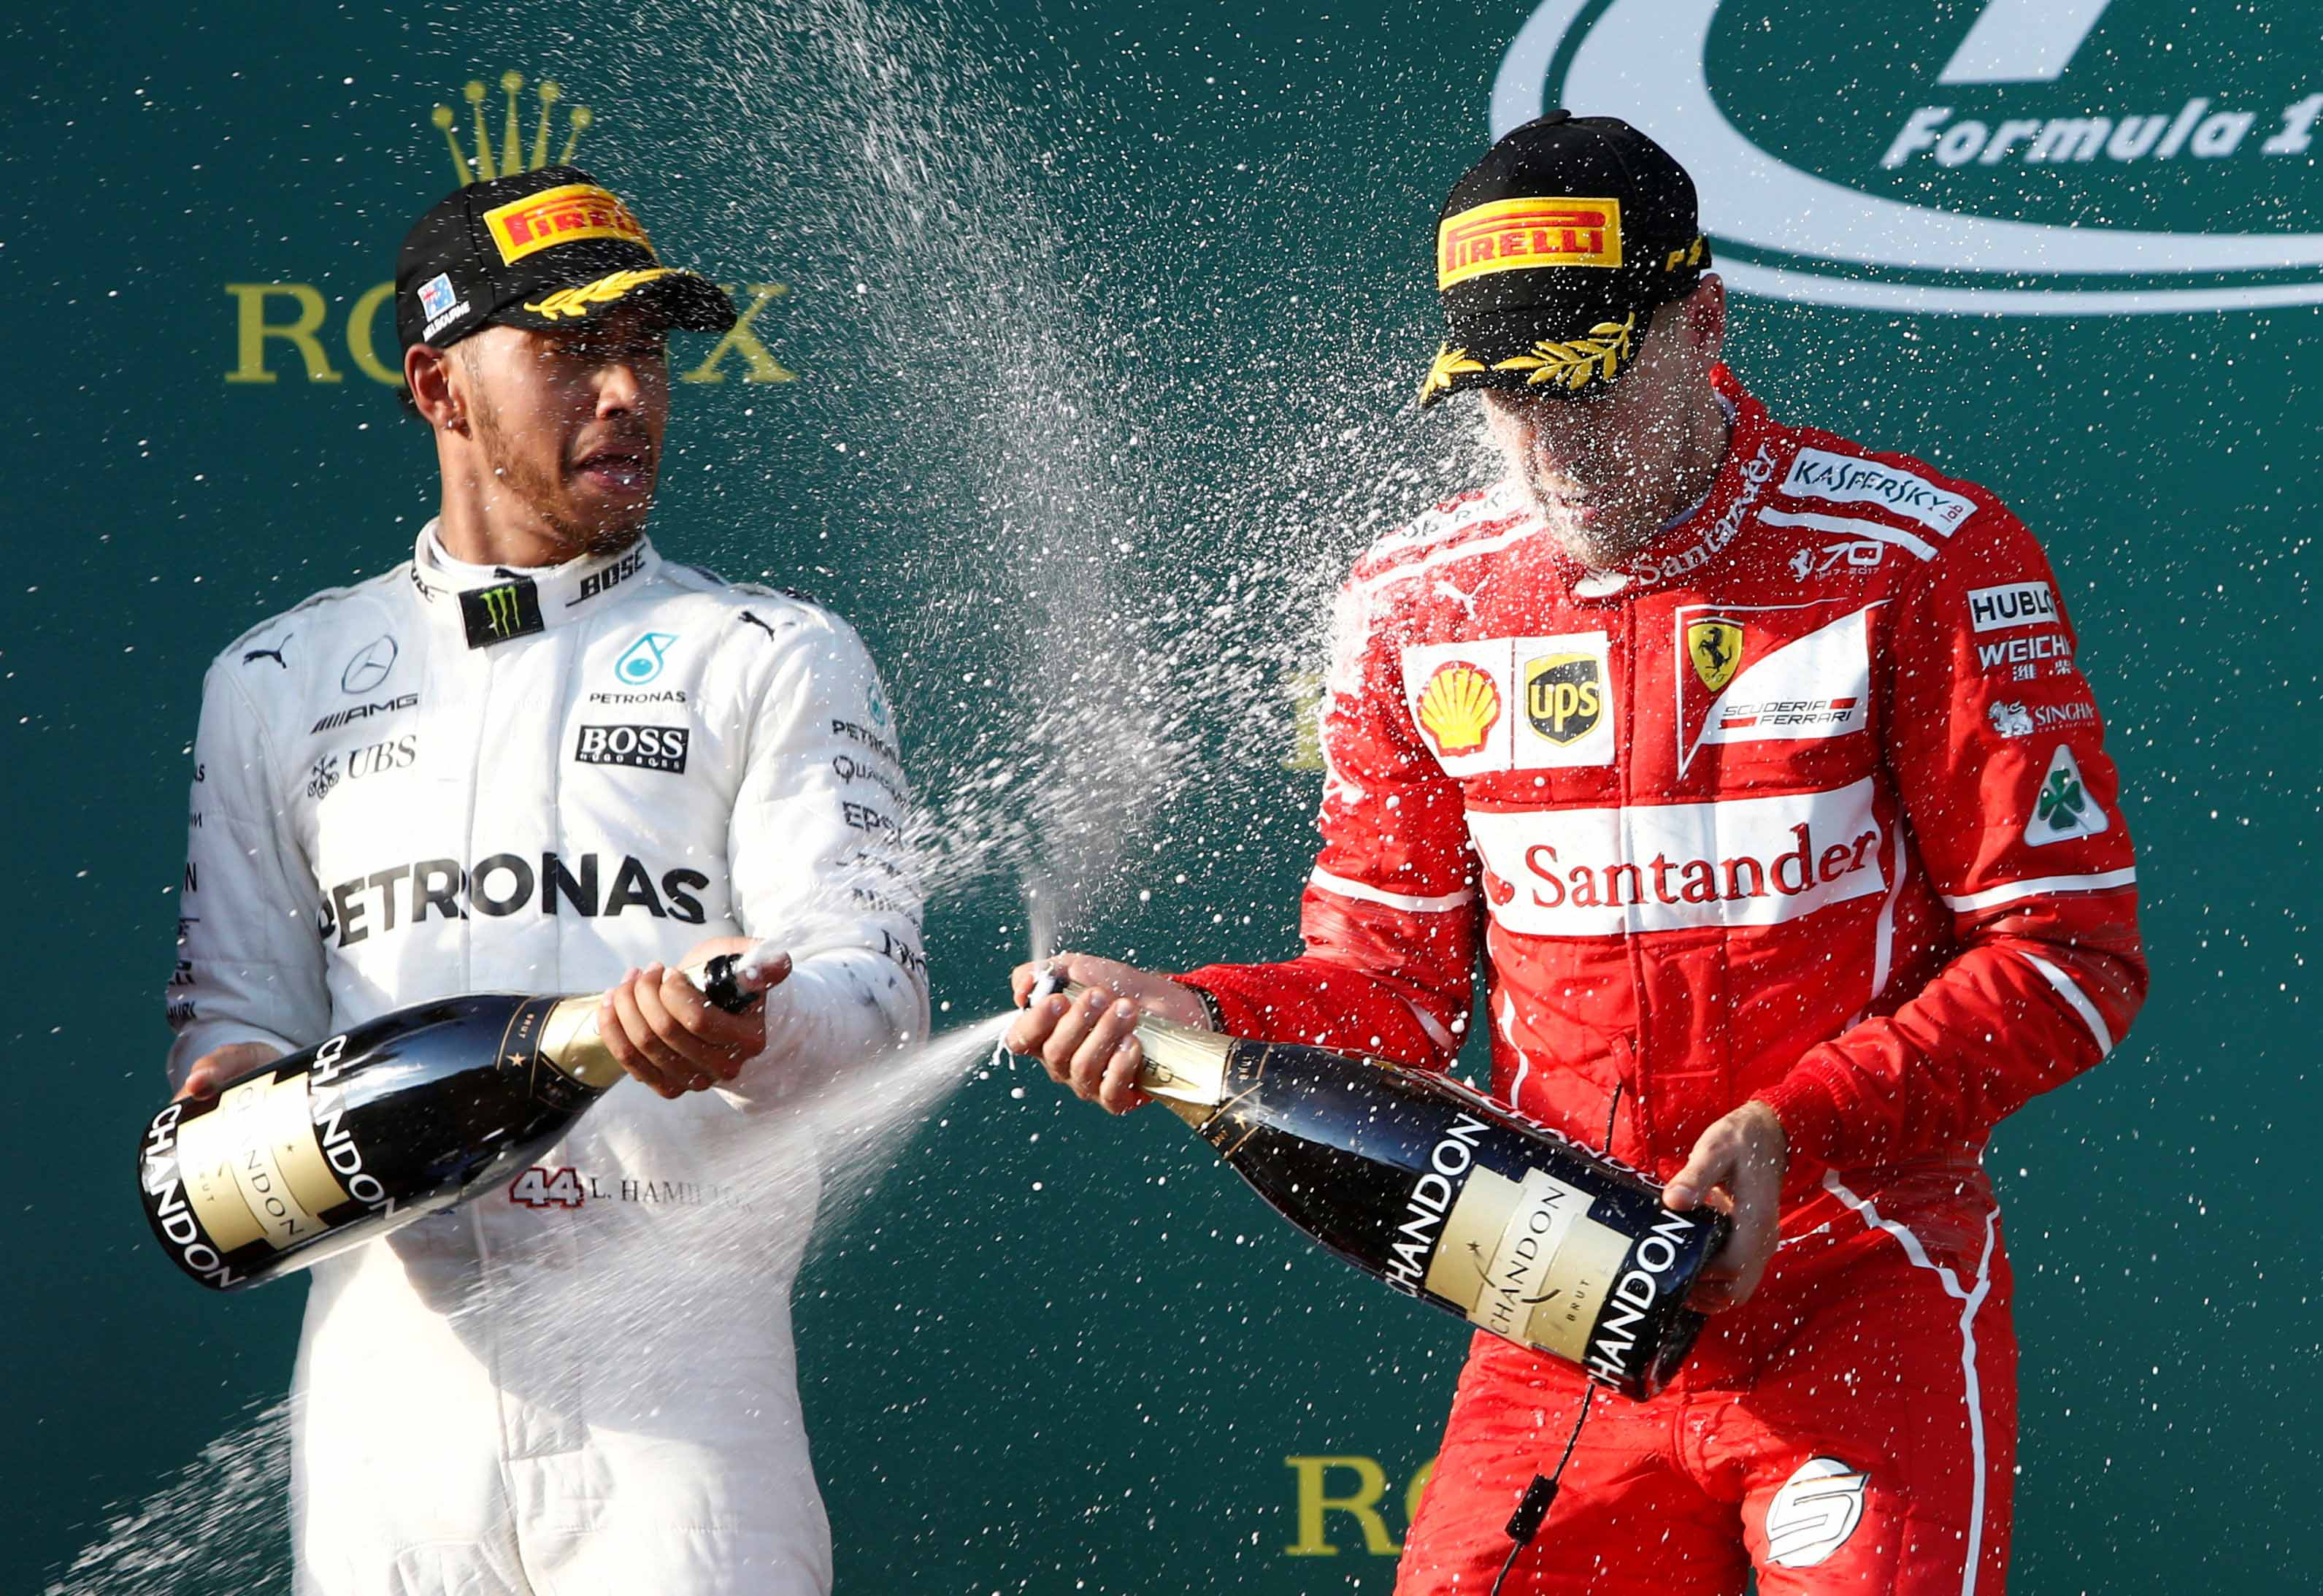 Vettel, Stade Français, Ronaldo : les 10 images fortes du week-end